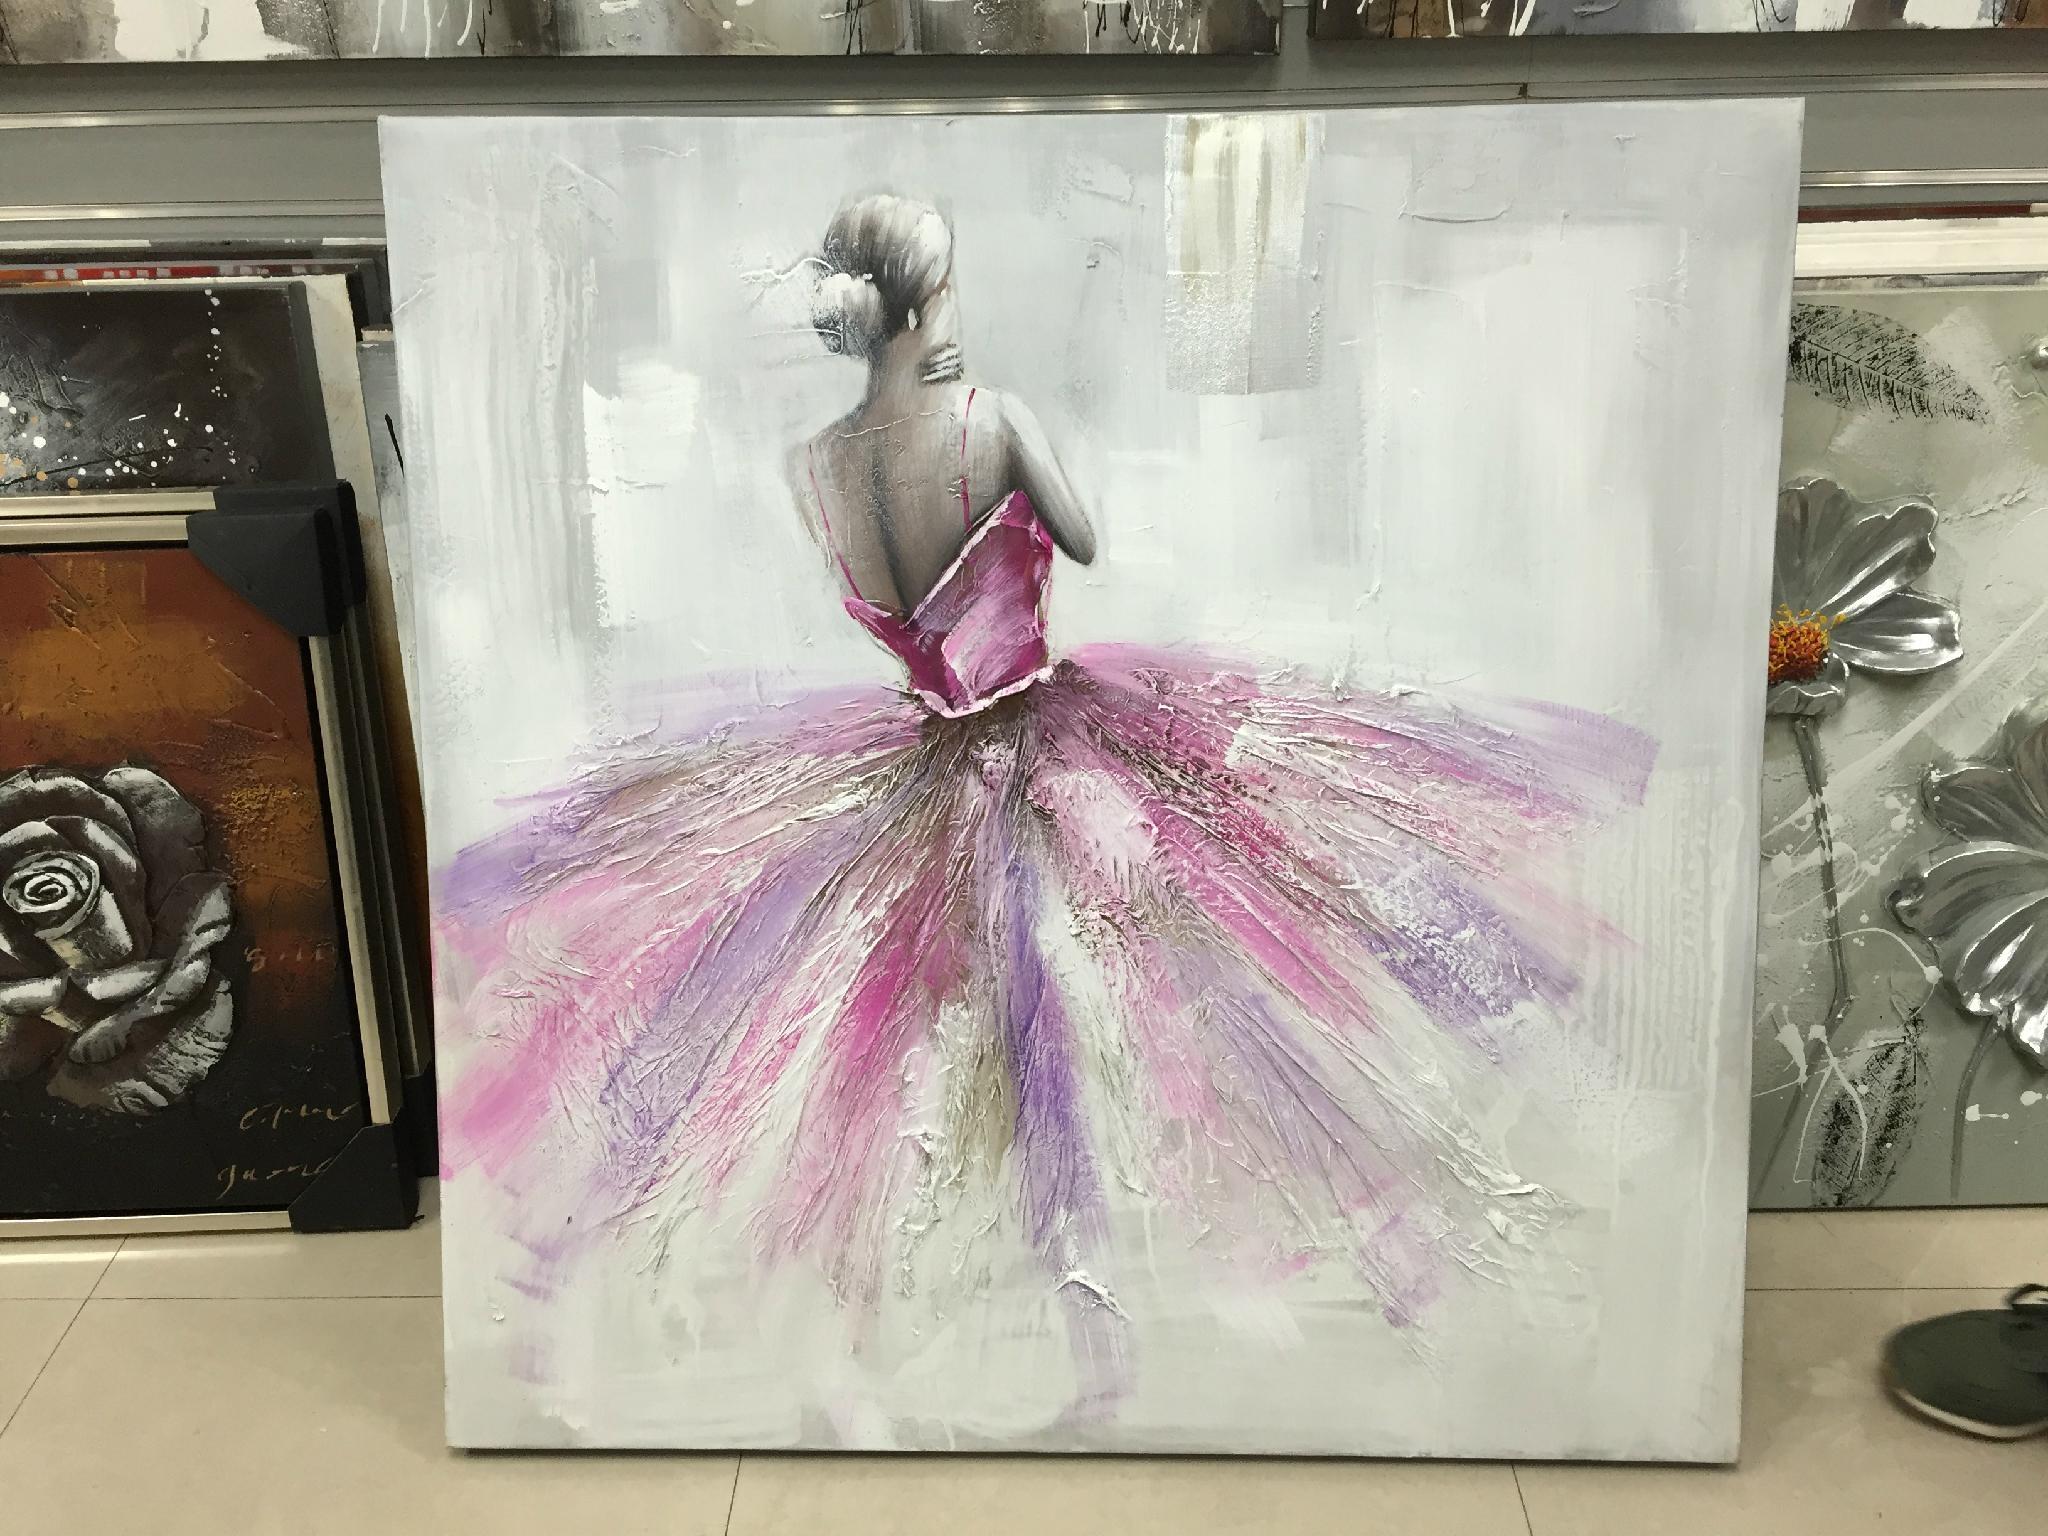 Moden Decorative 3d Handmade White Flower Oil Painting Heavy Texture